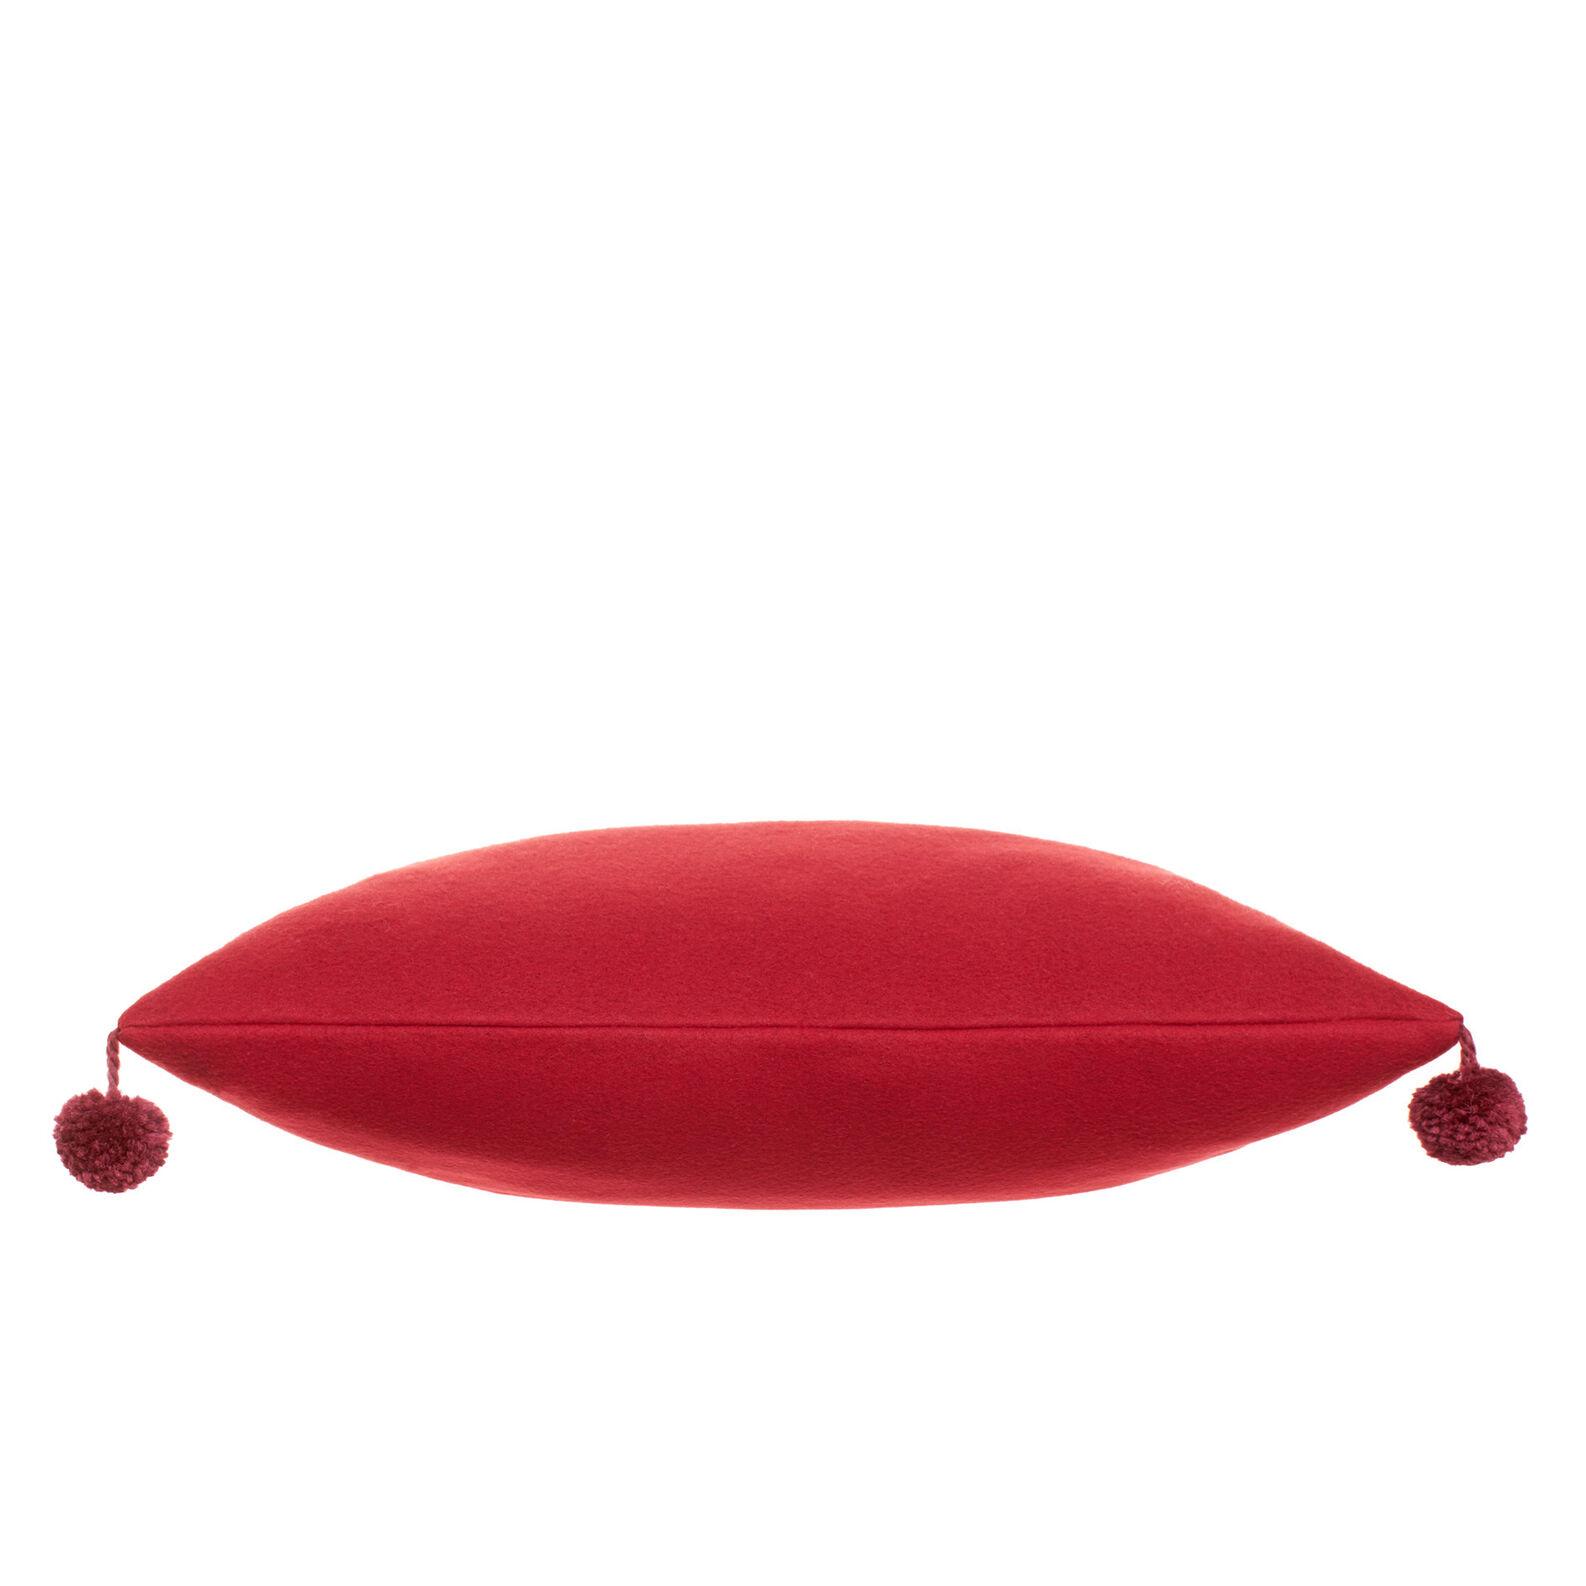 Cuscino in pile con pompon